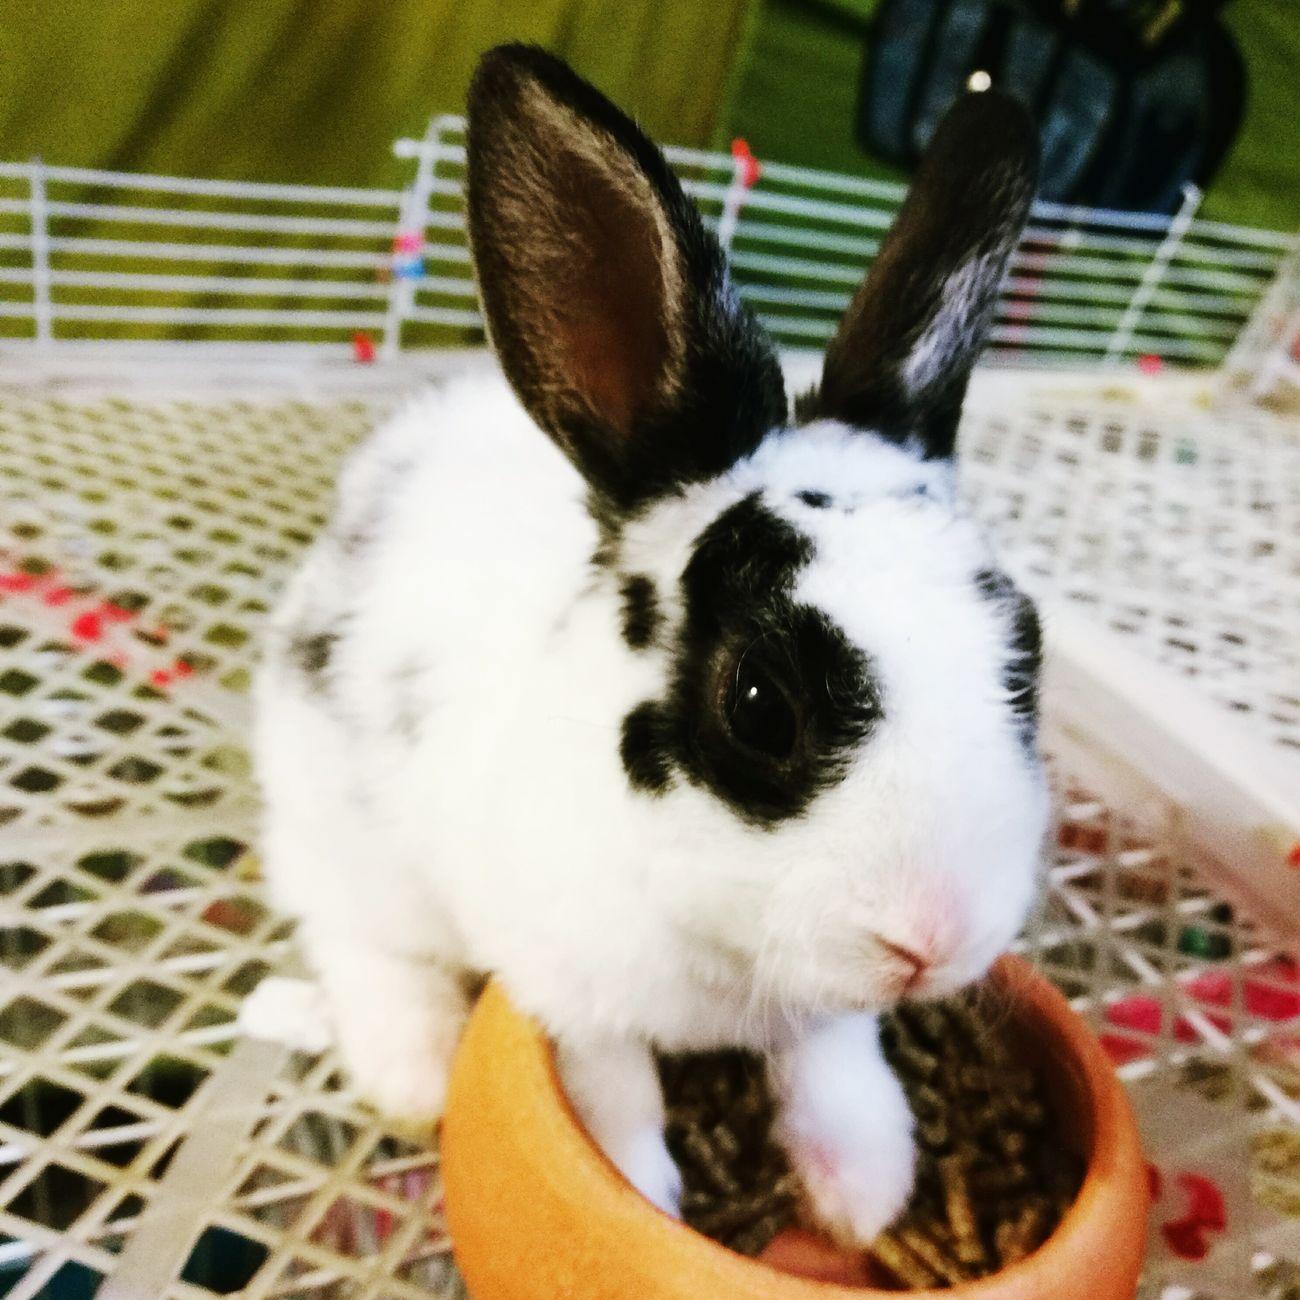 Rabbit . Rabbit ❤️ Animal Themes Pets One Animal Rabbit Rabbit - Animal